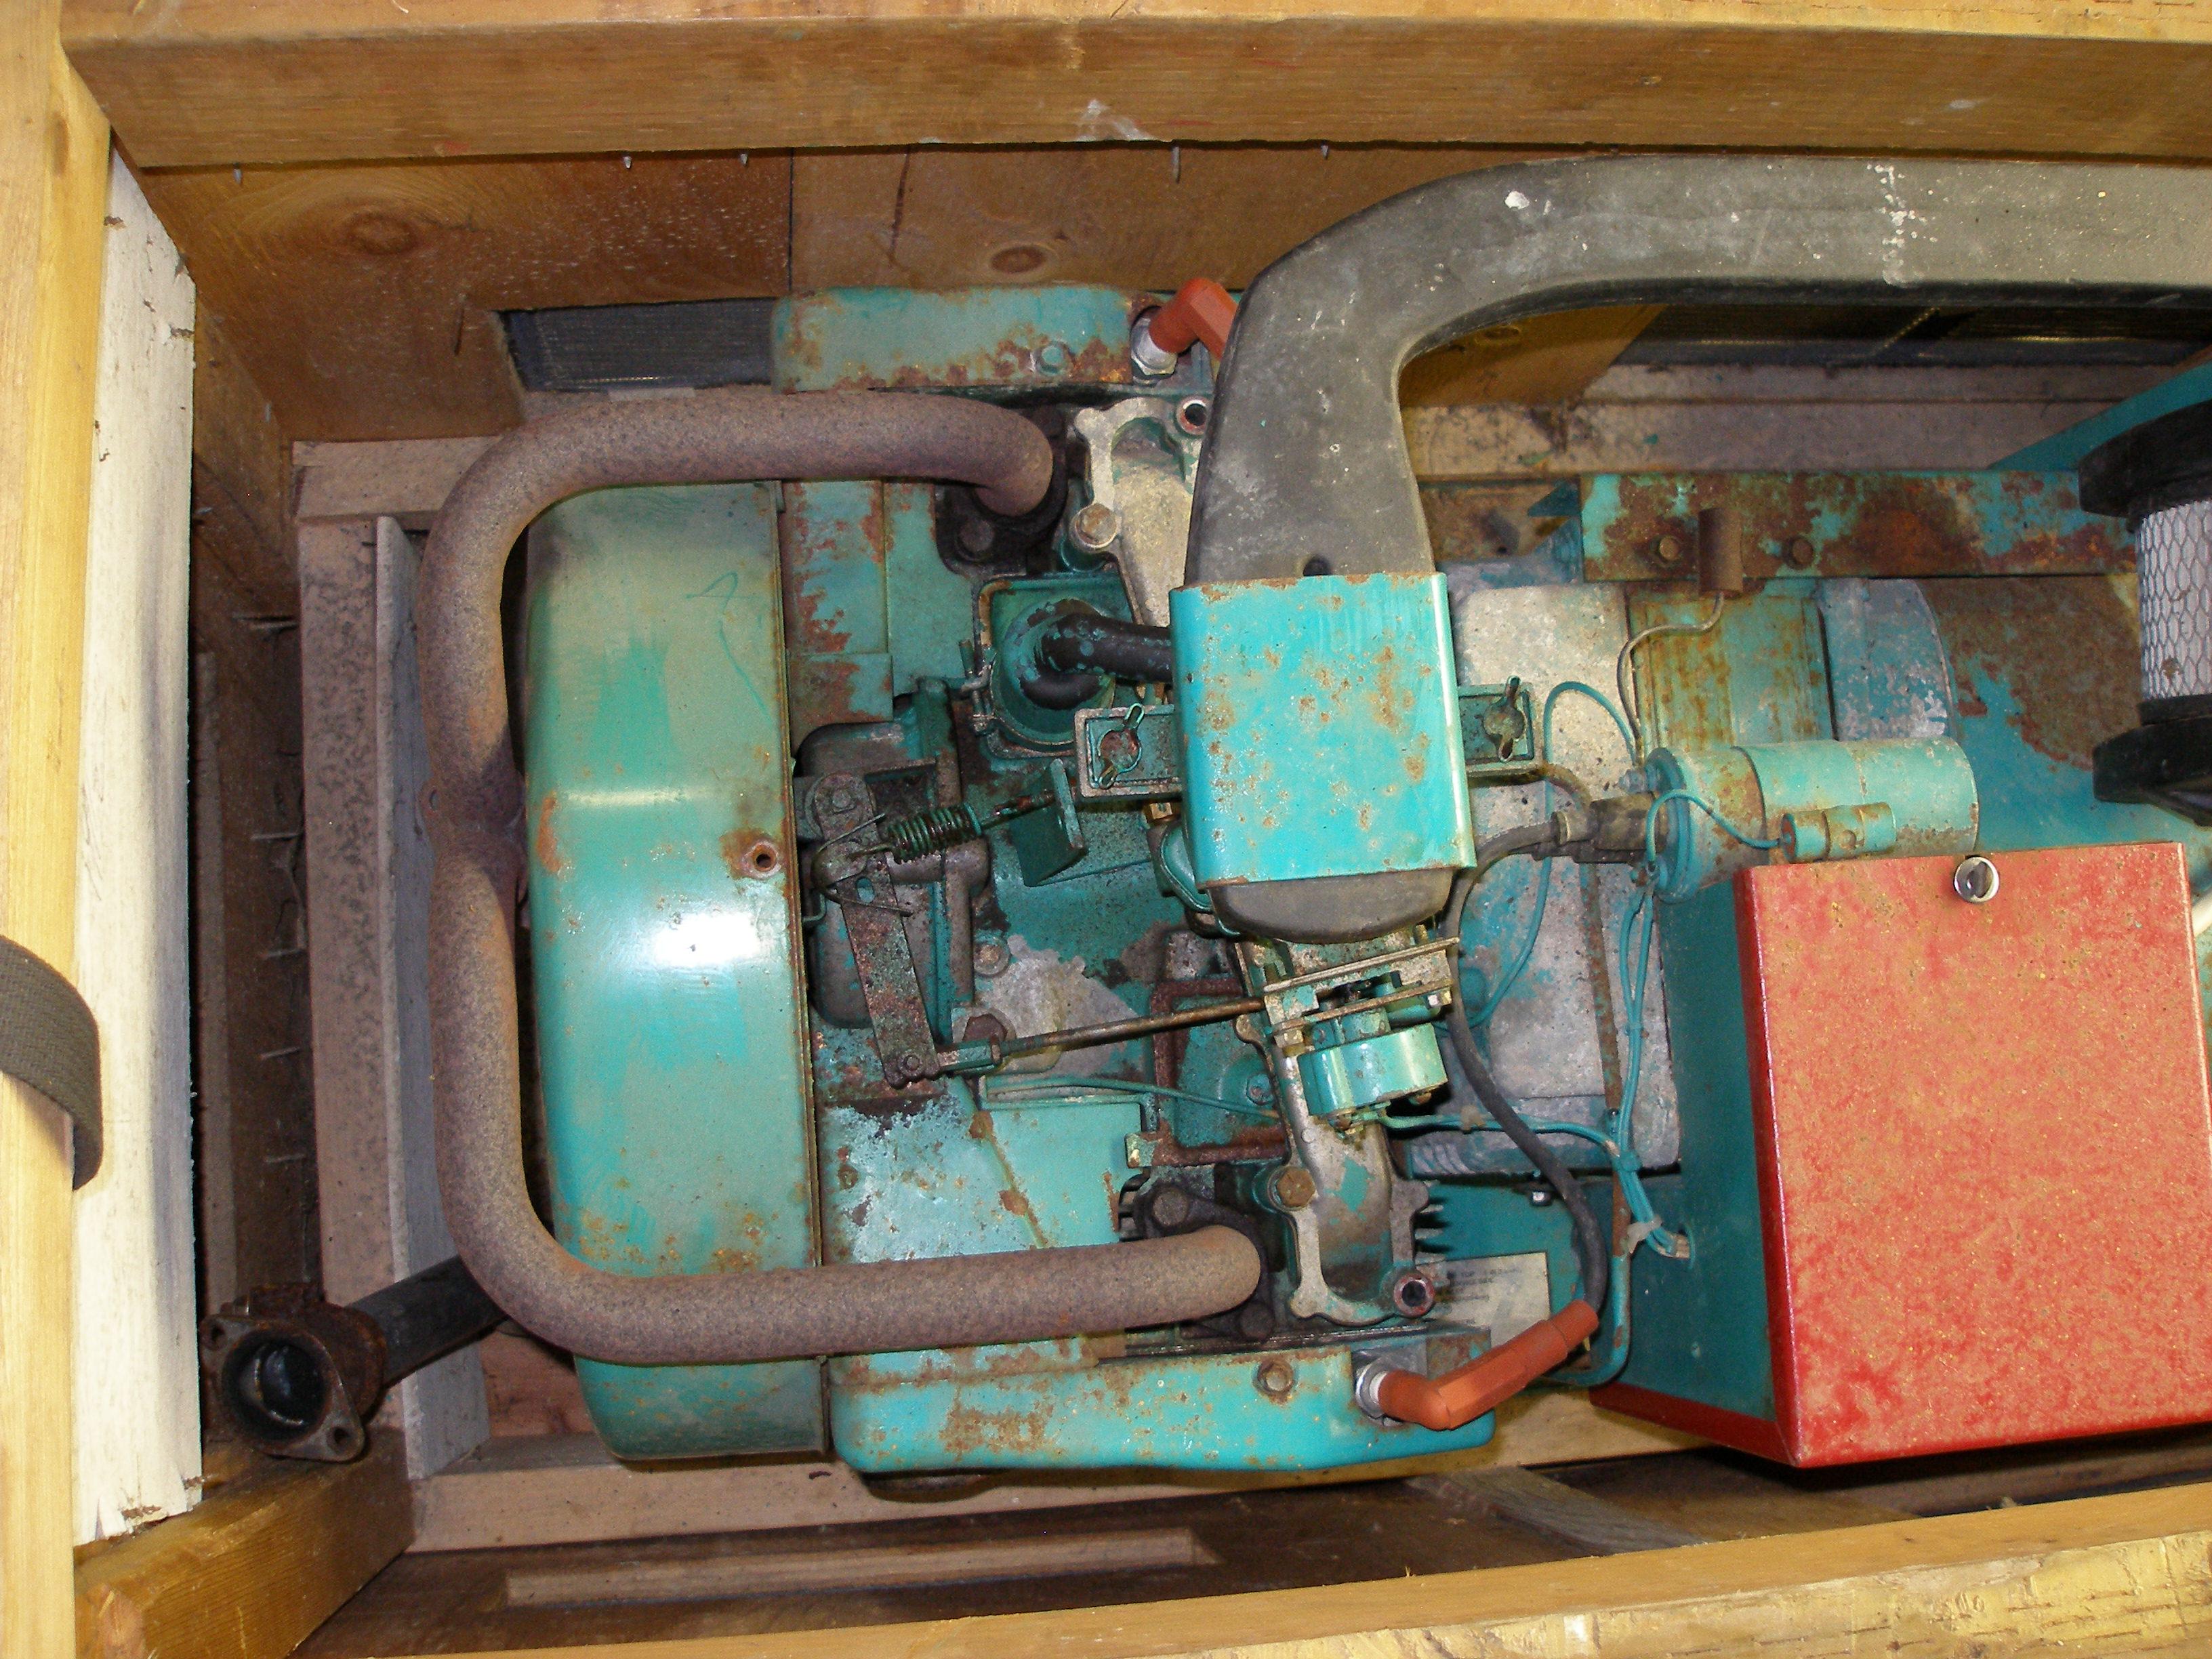 Onan Bfa Manual For Rjc Generators Wiring Diagrams Bfbfanhbga Genset Rv Generator Service Oem Array Nissandiesel Forums U2022 View Topic 4kw Des Moines Rh Dyndns